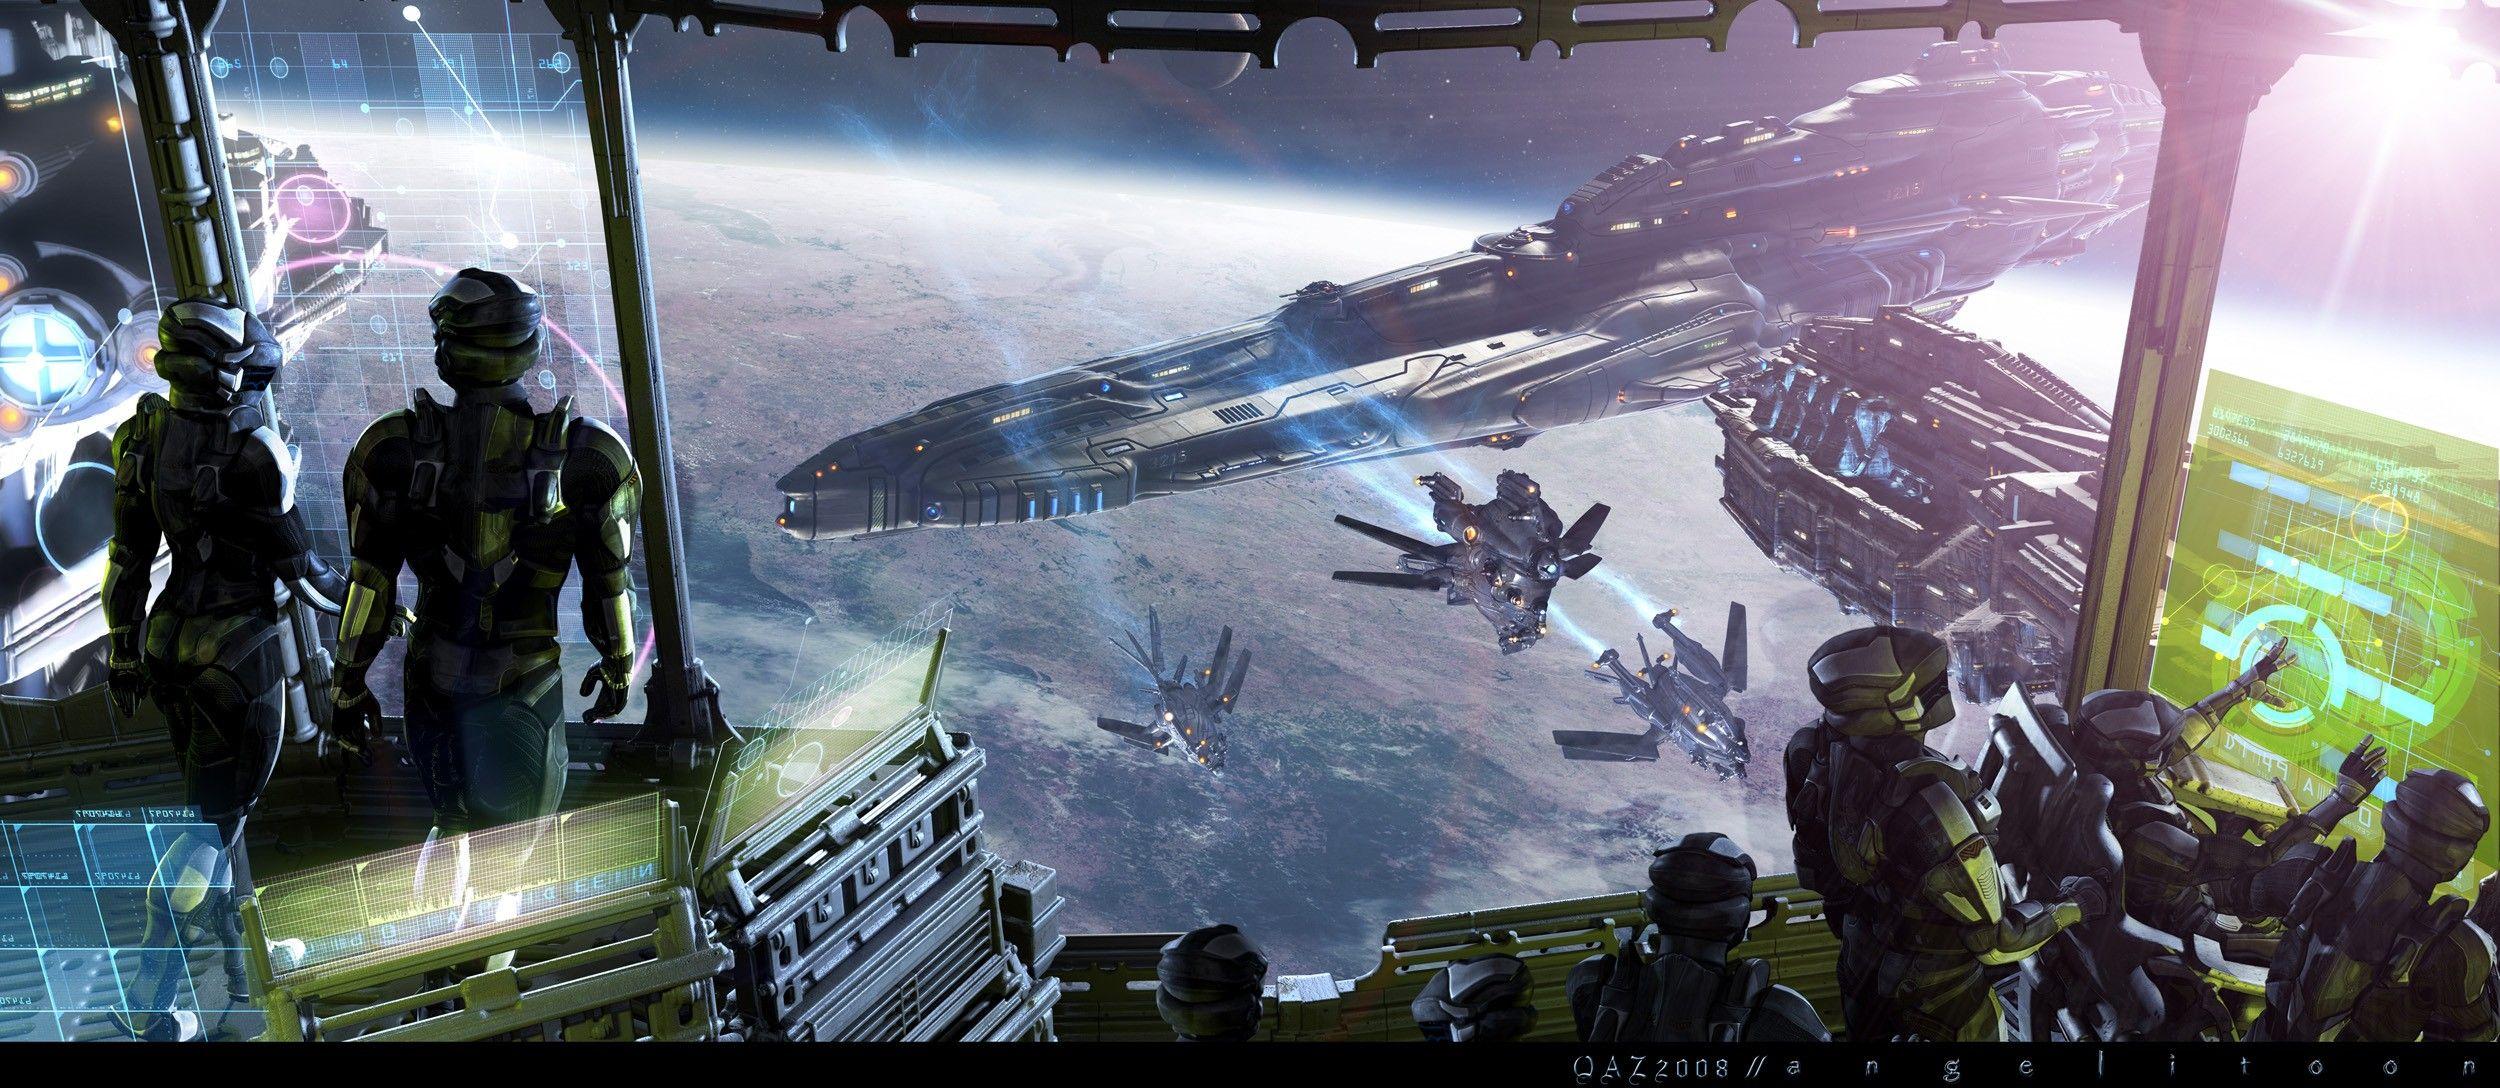 Spaceship Computer Wallpapers Desktop Backgrounds 2500x1088 Id 165325 Spaceship Art Background Images Art